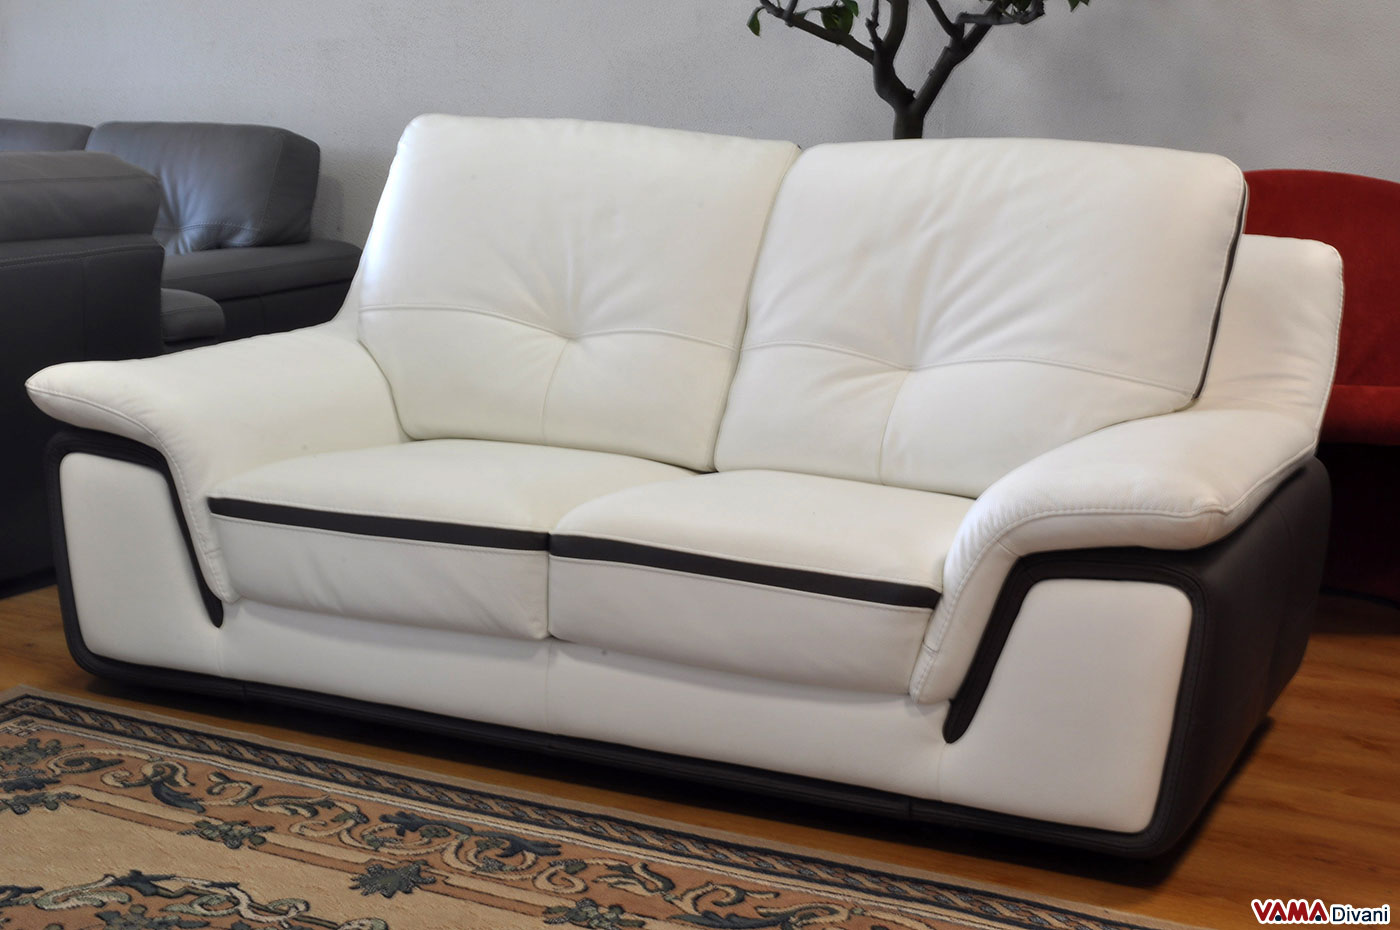 Offerta divano moderno in vera pelle vama divani